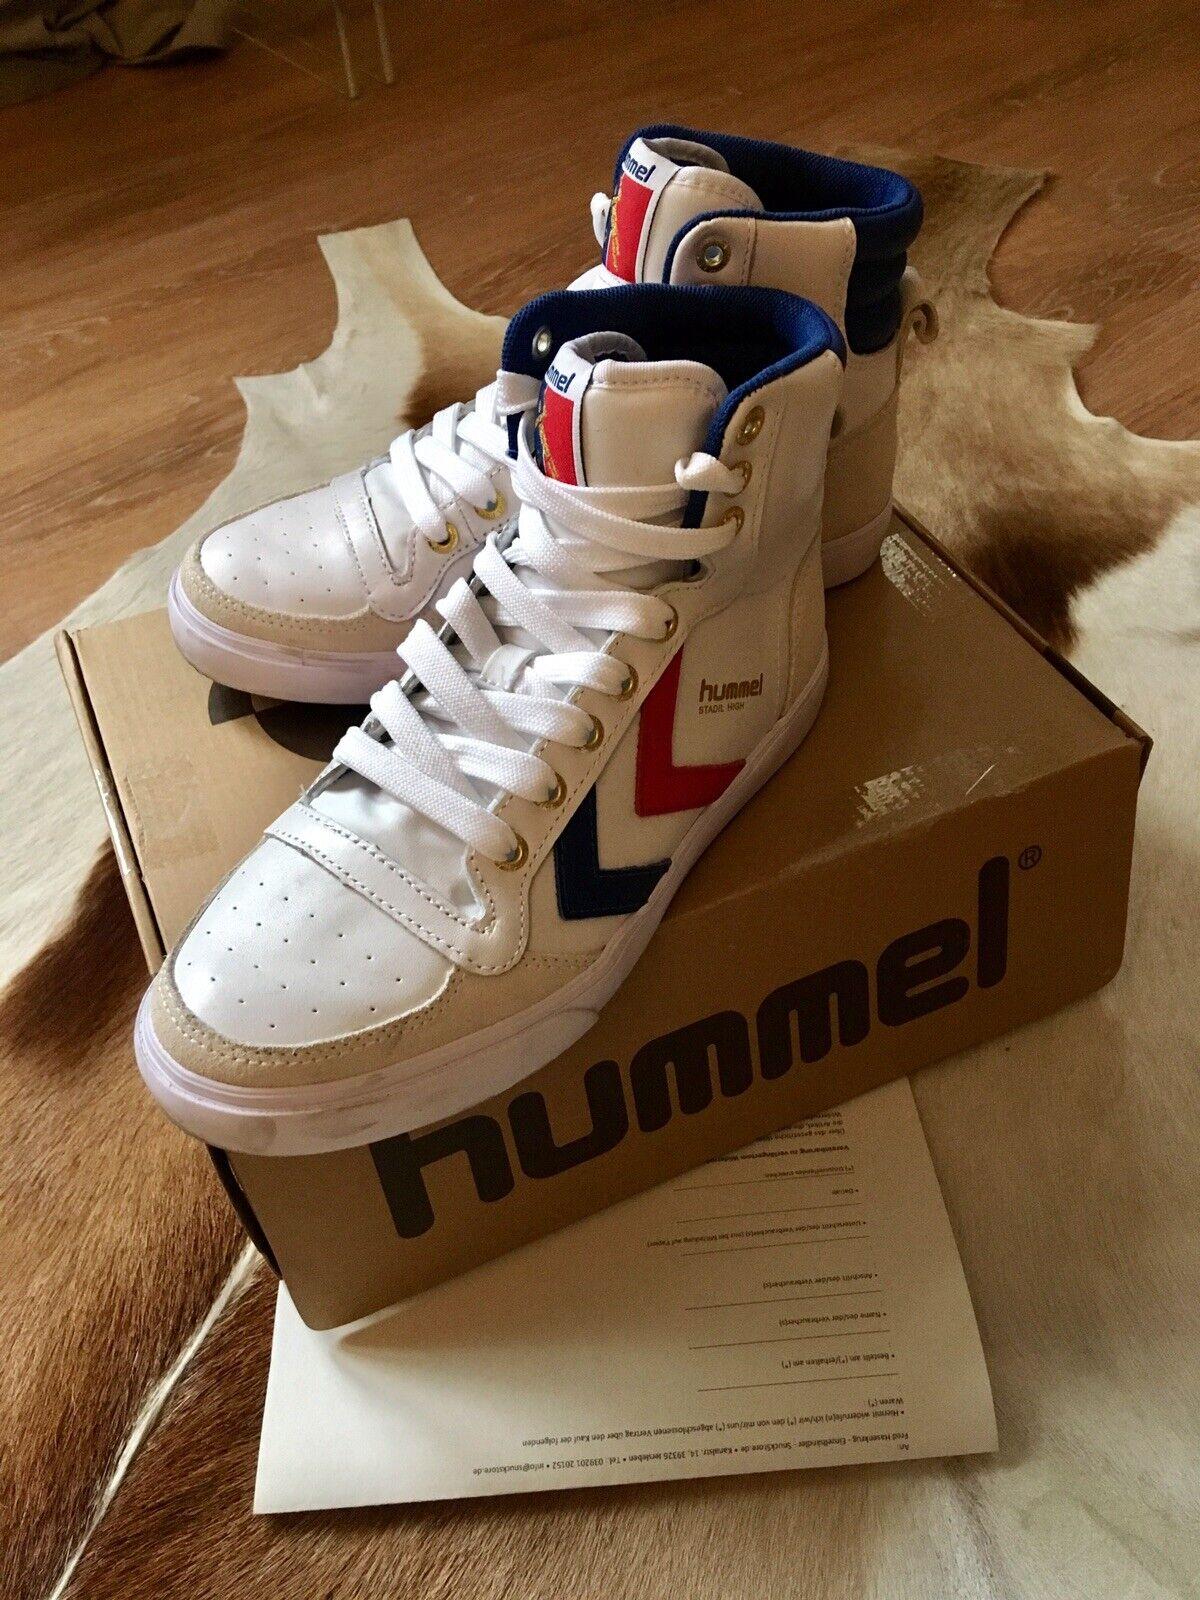 Hummel,Turnschuhe,Turnschuh,Slimmer Stadil High,Leder,blau,weiss,rot, Gr. 38